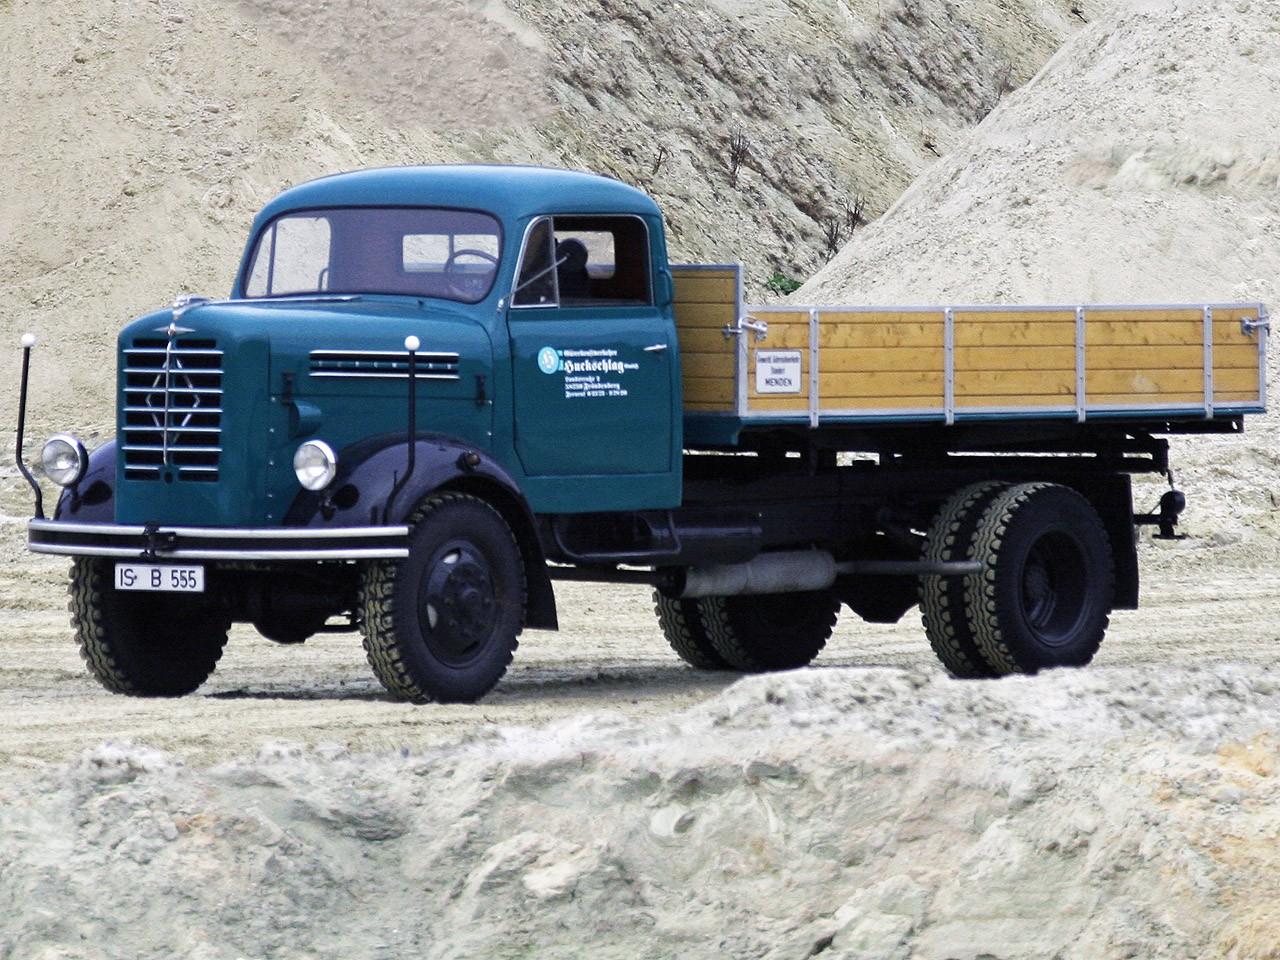 1957 Borgward B555